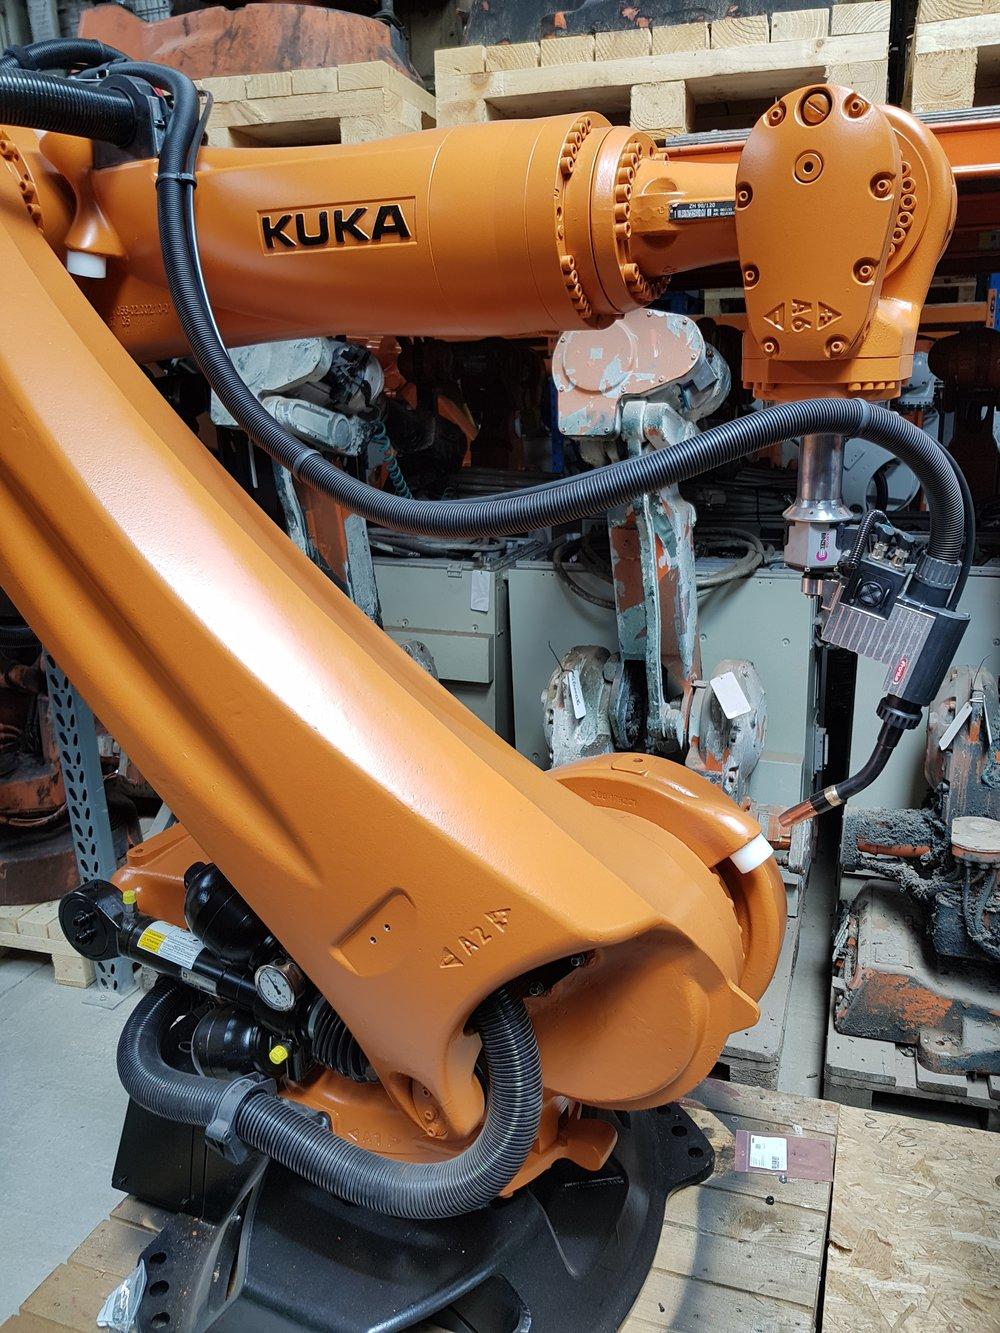 Robotics and architecture experimentation session - TBA£175 Register Interest